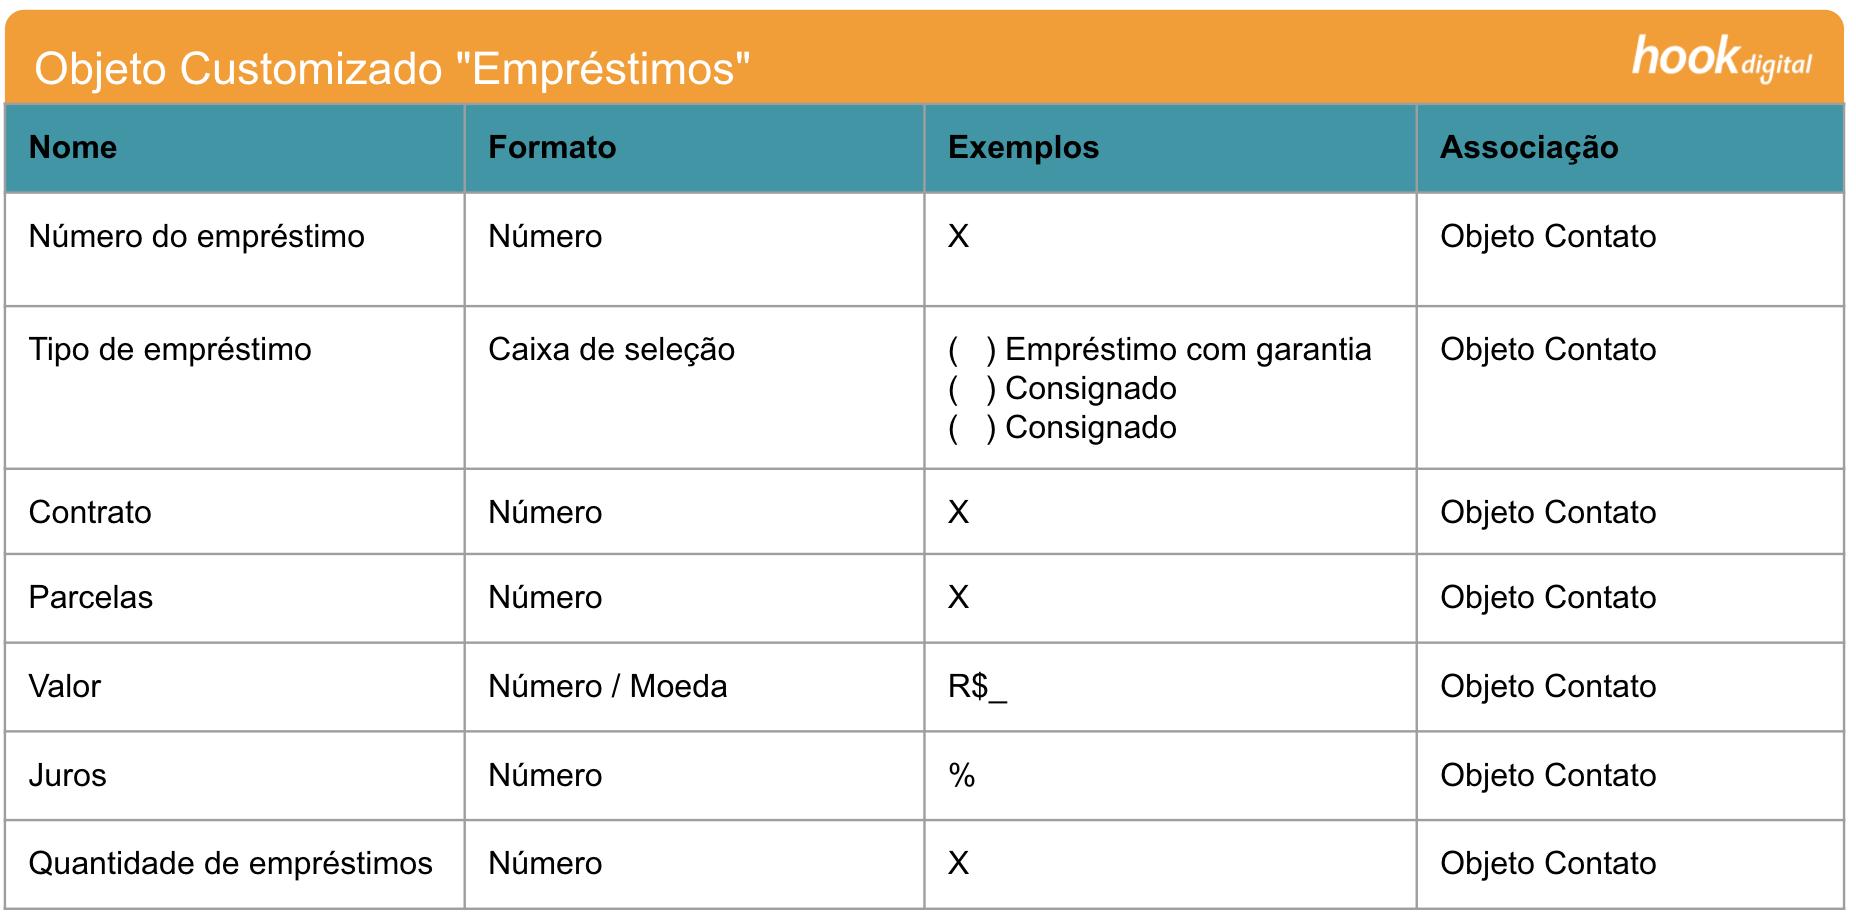 Objetos Customizados HubSpot - Emprestimos